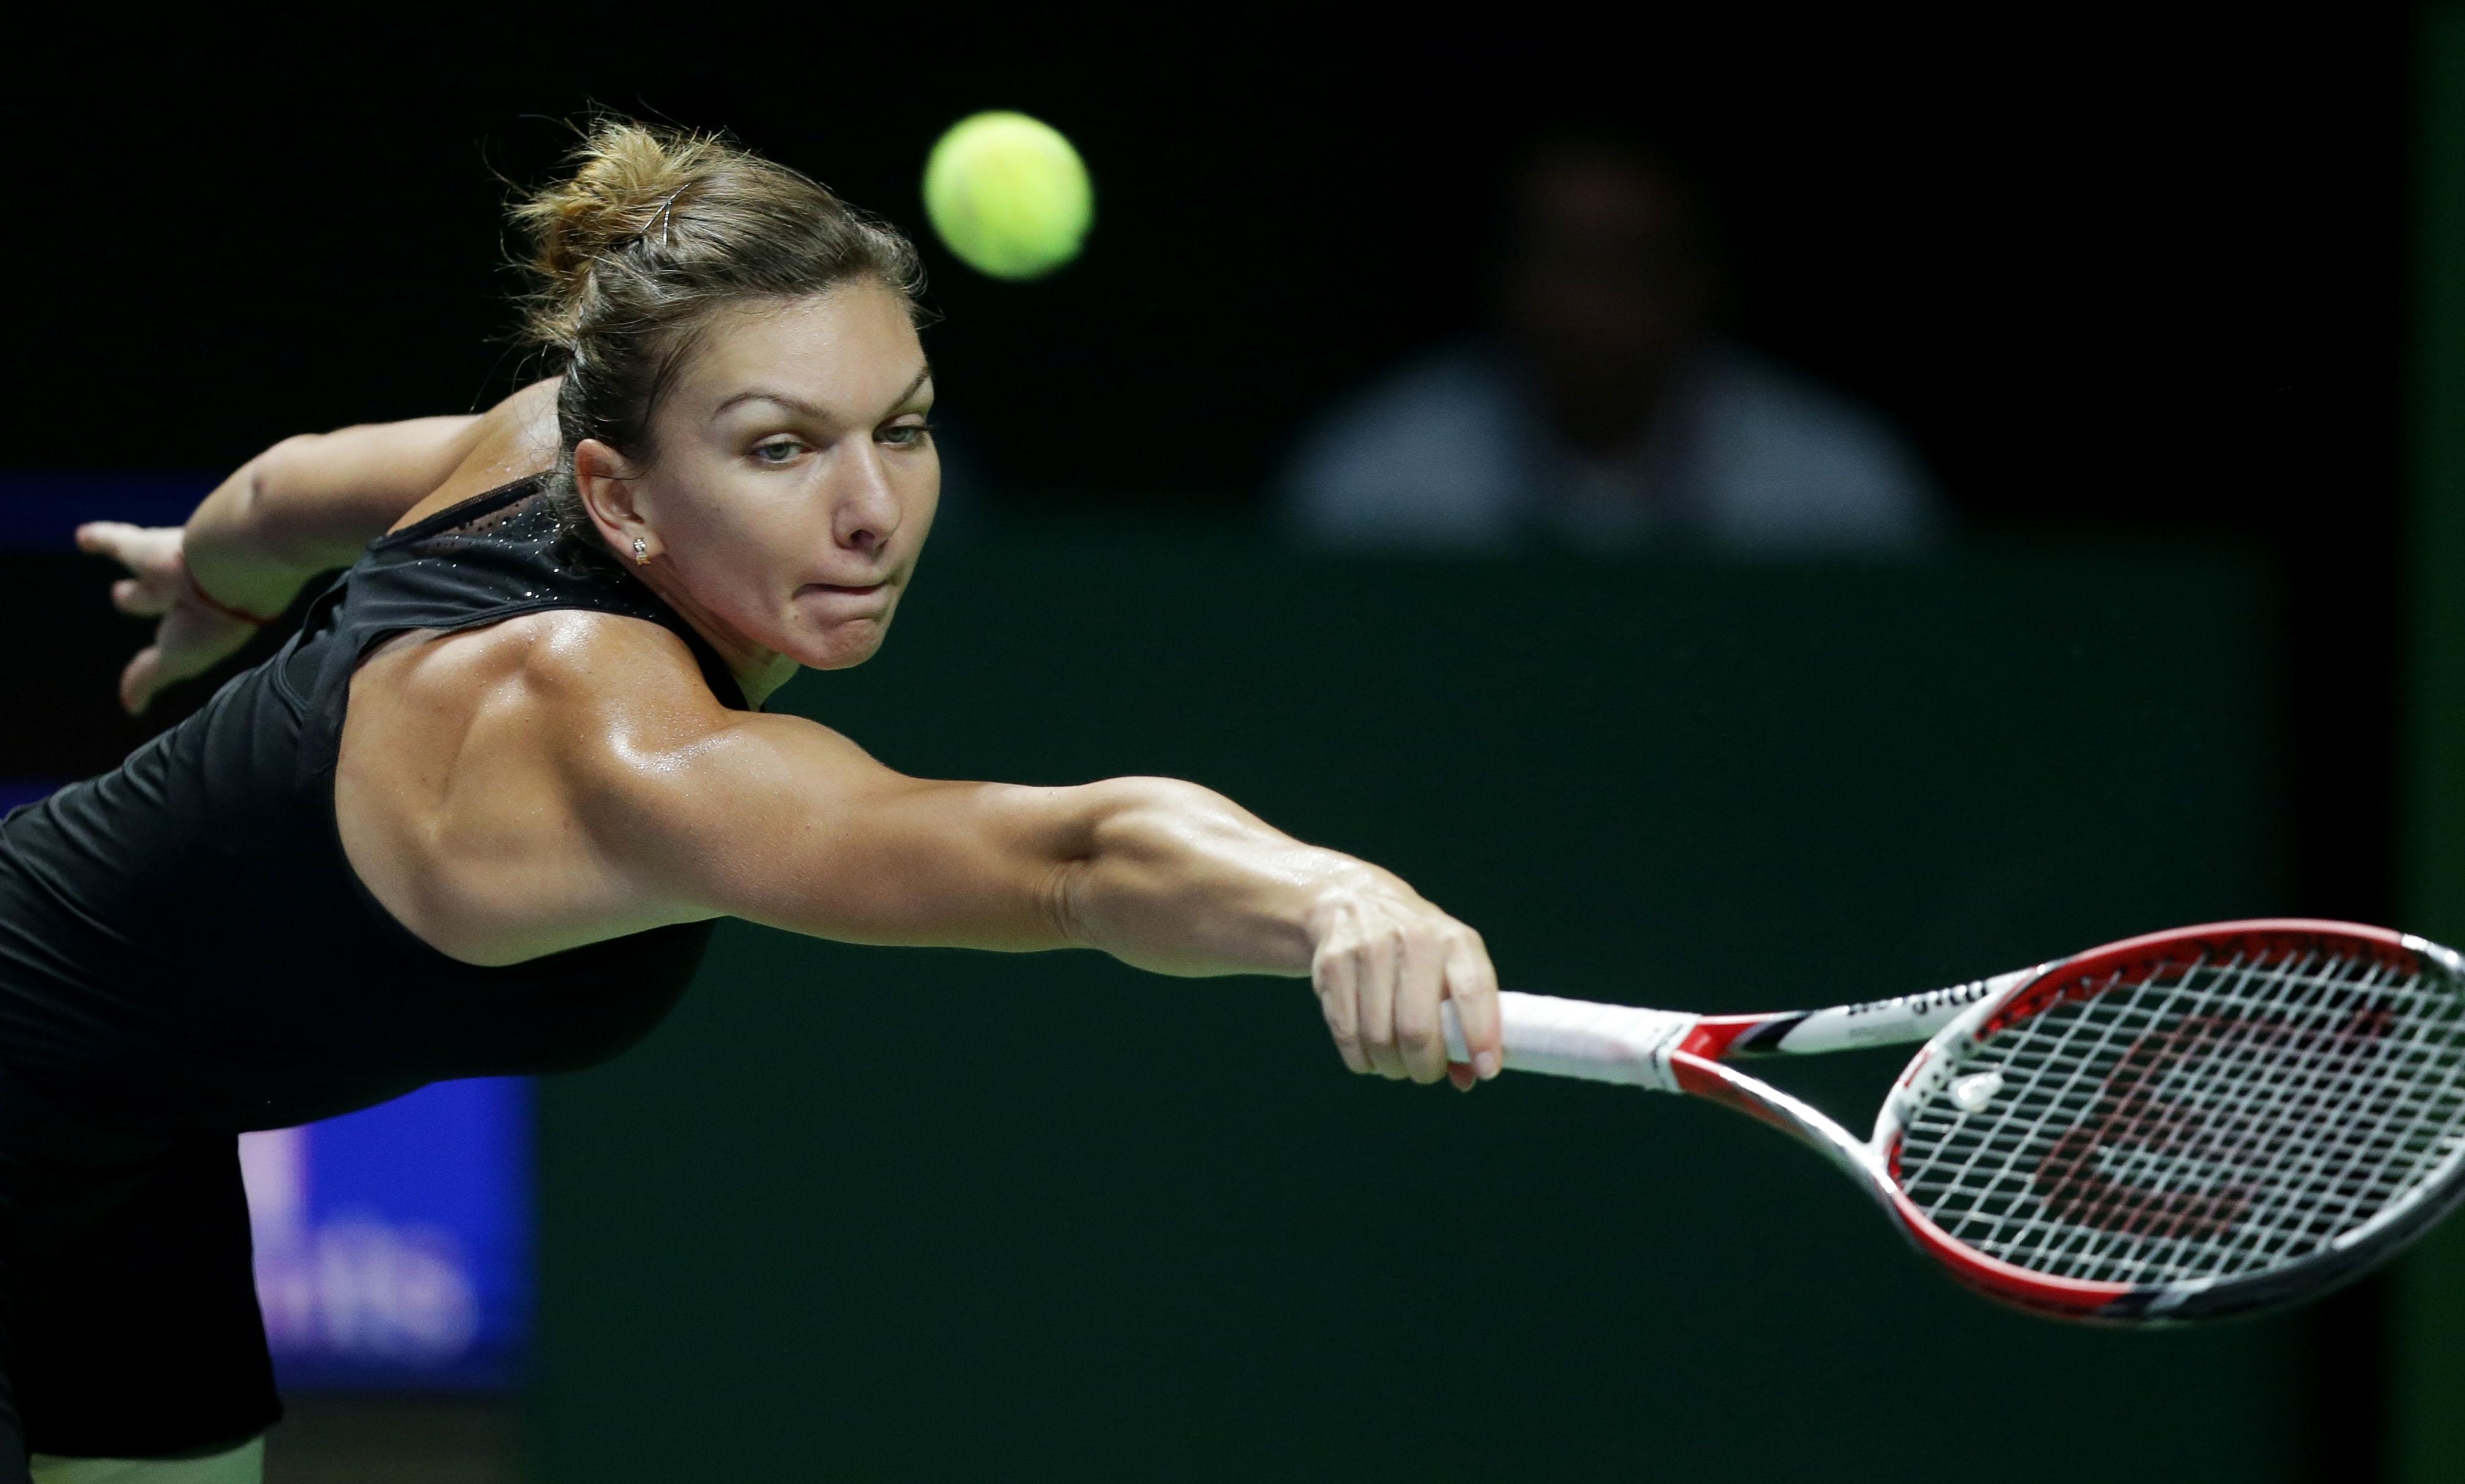 Wallpaper : Sports, Rings, Simona Halep, Tennis Player